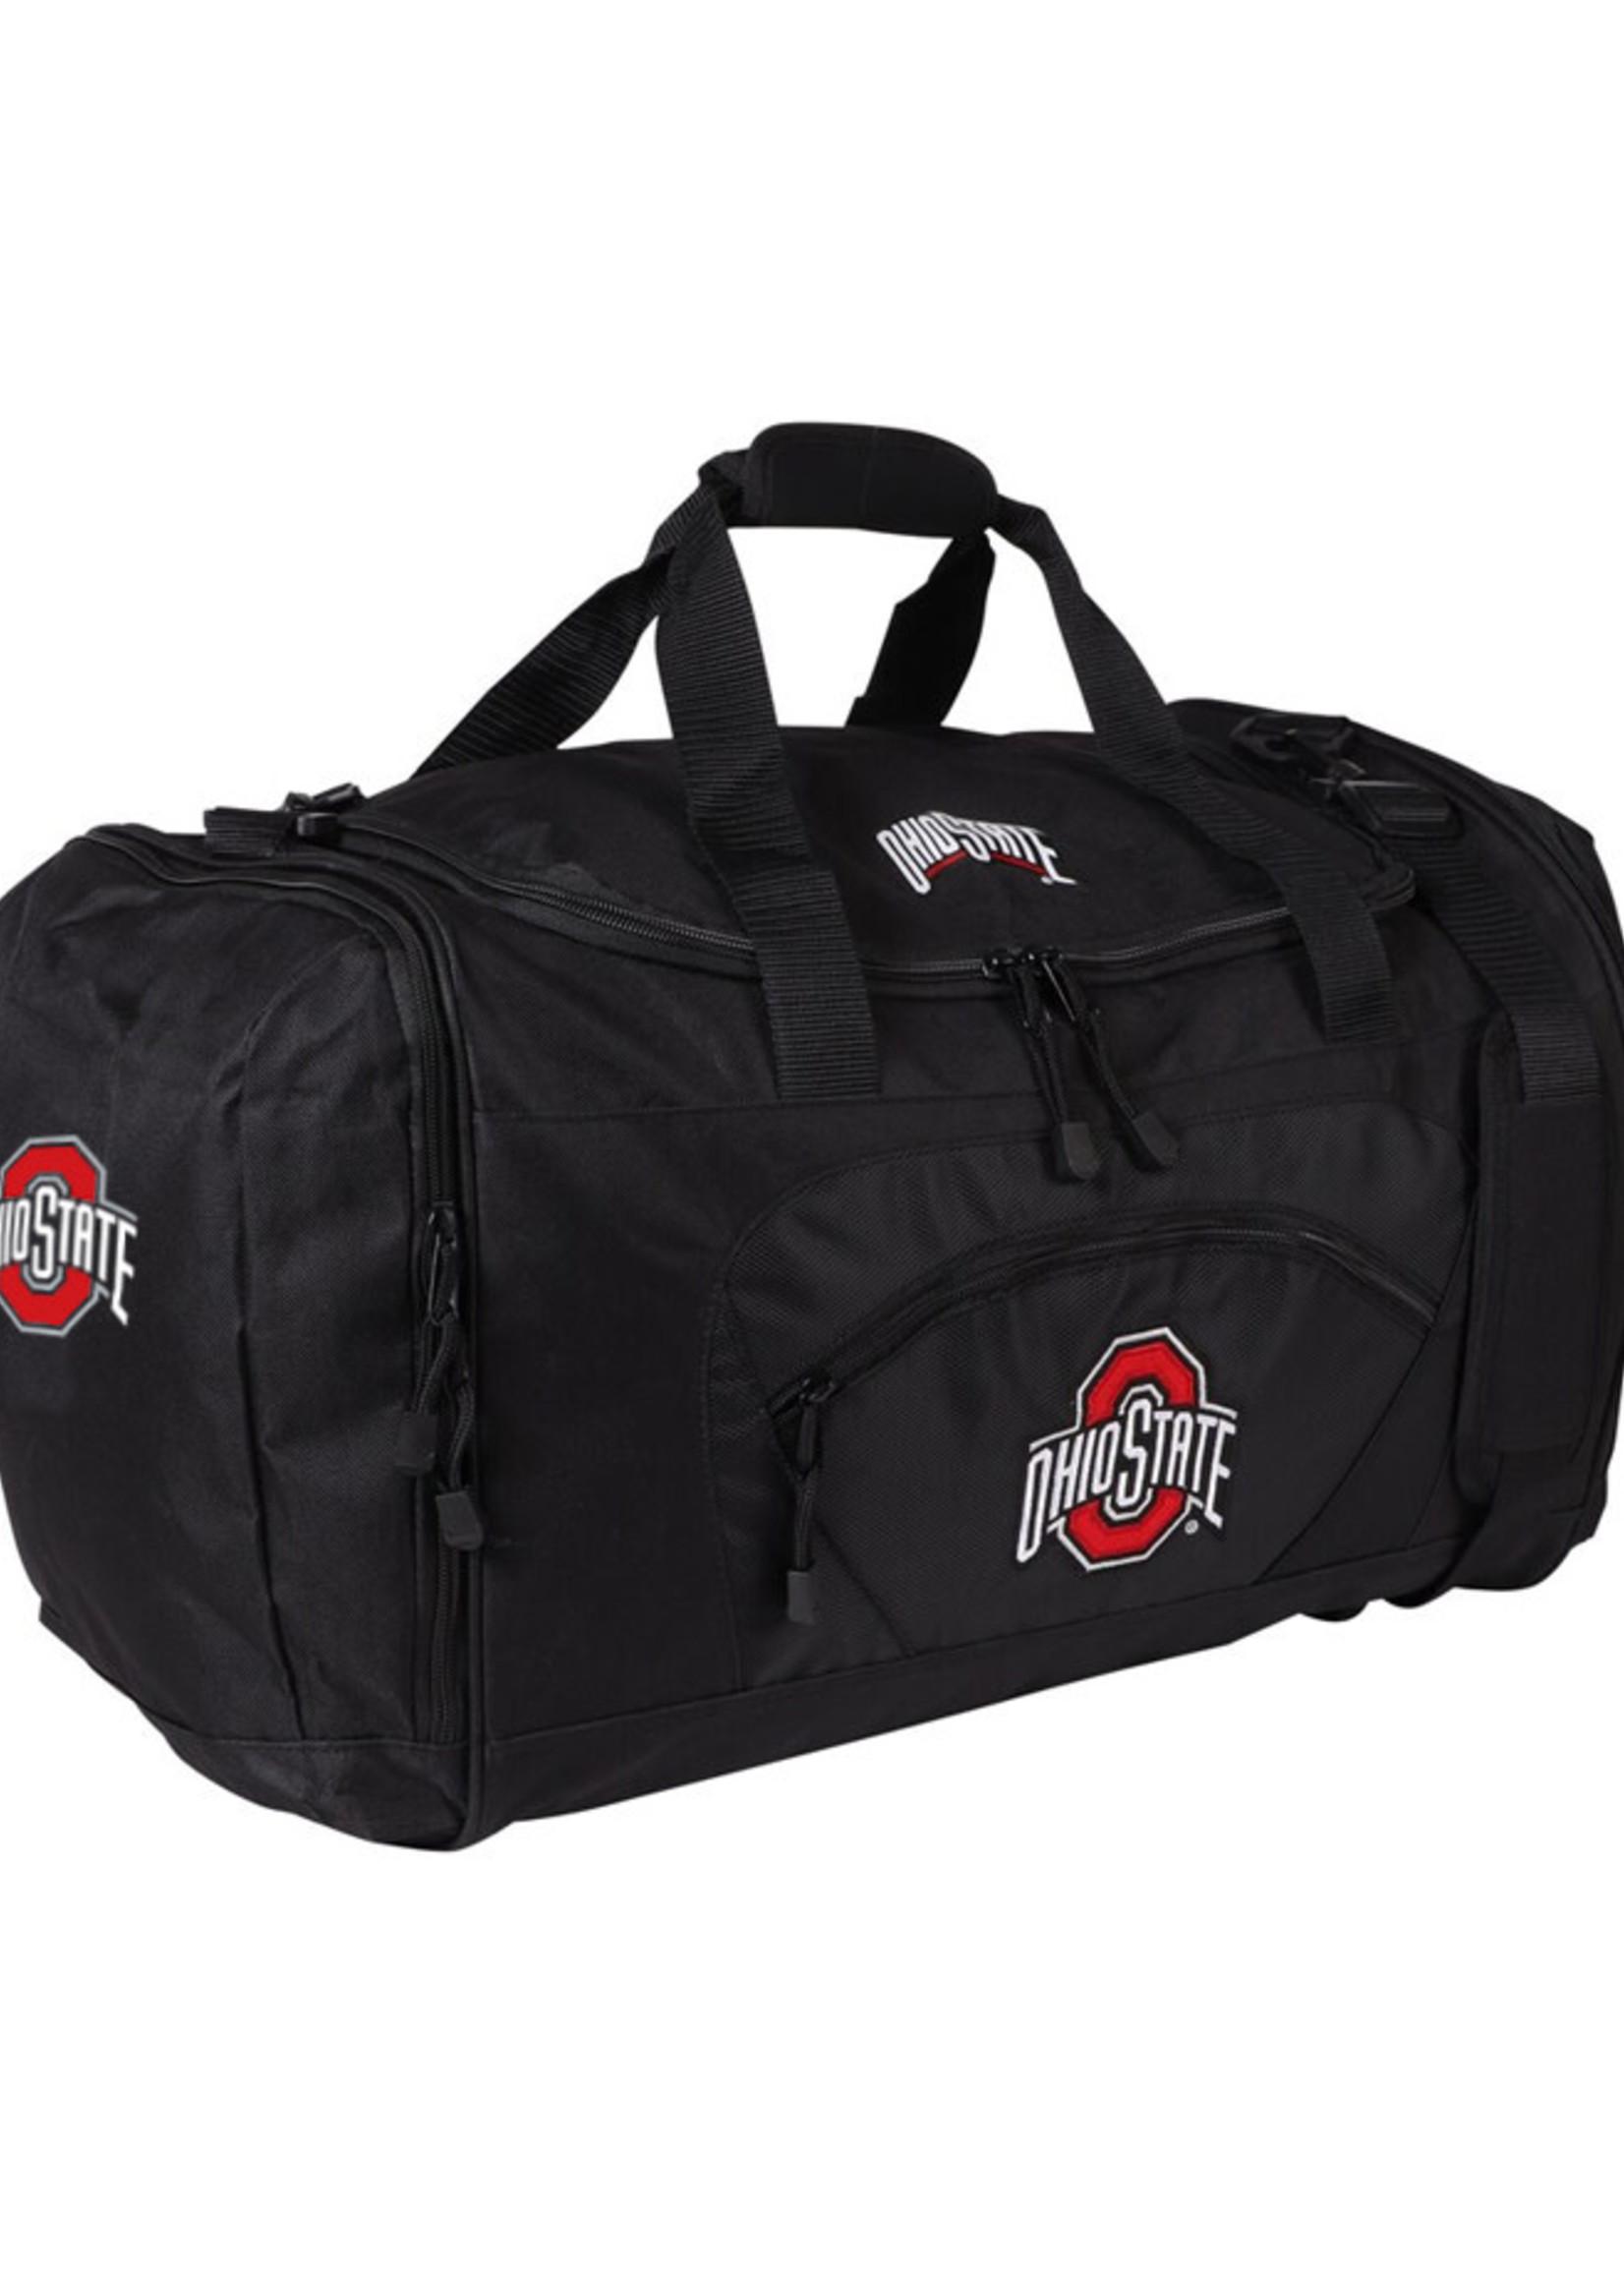 Ohio State Buckeyes Roadblock Duffel Bag